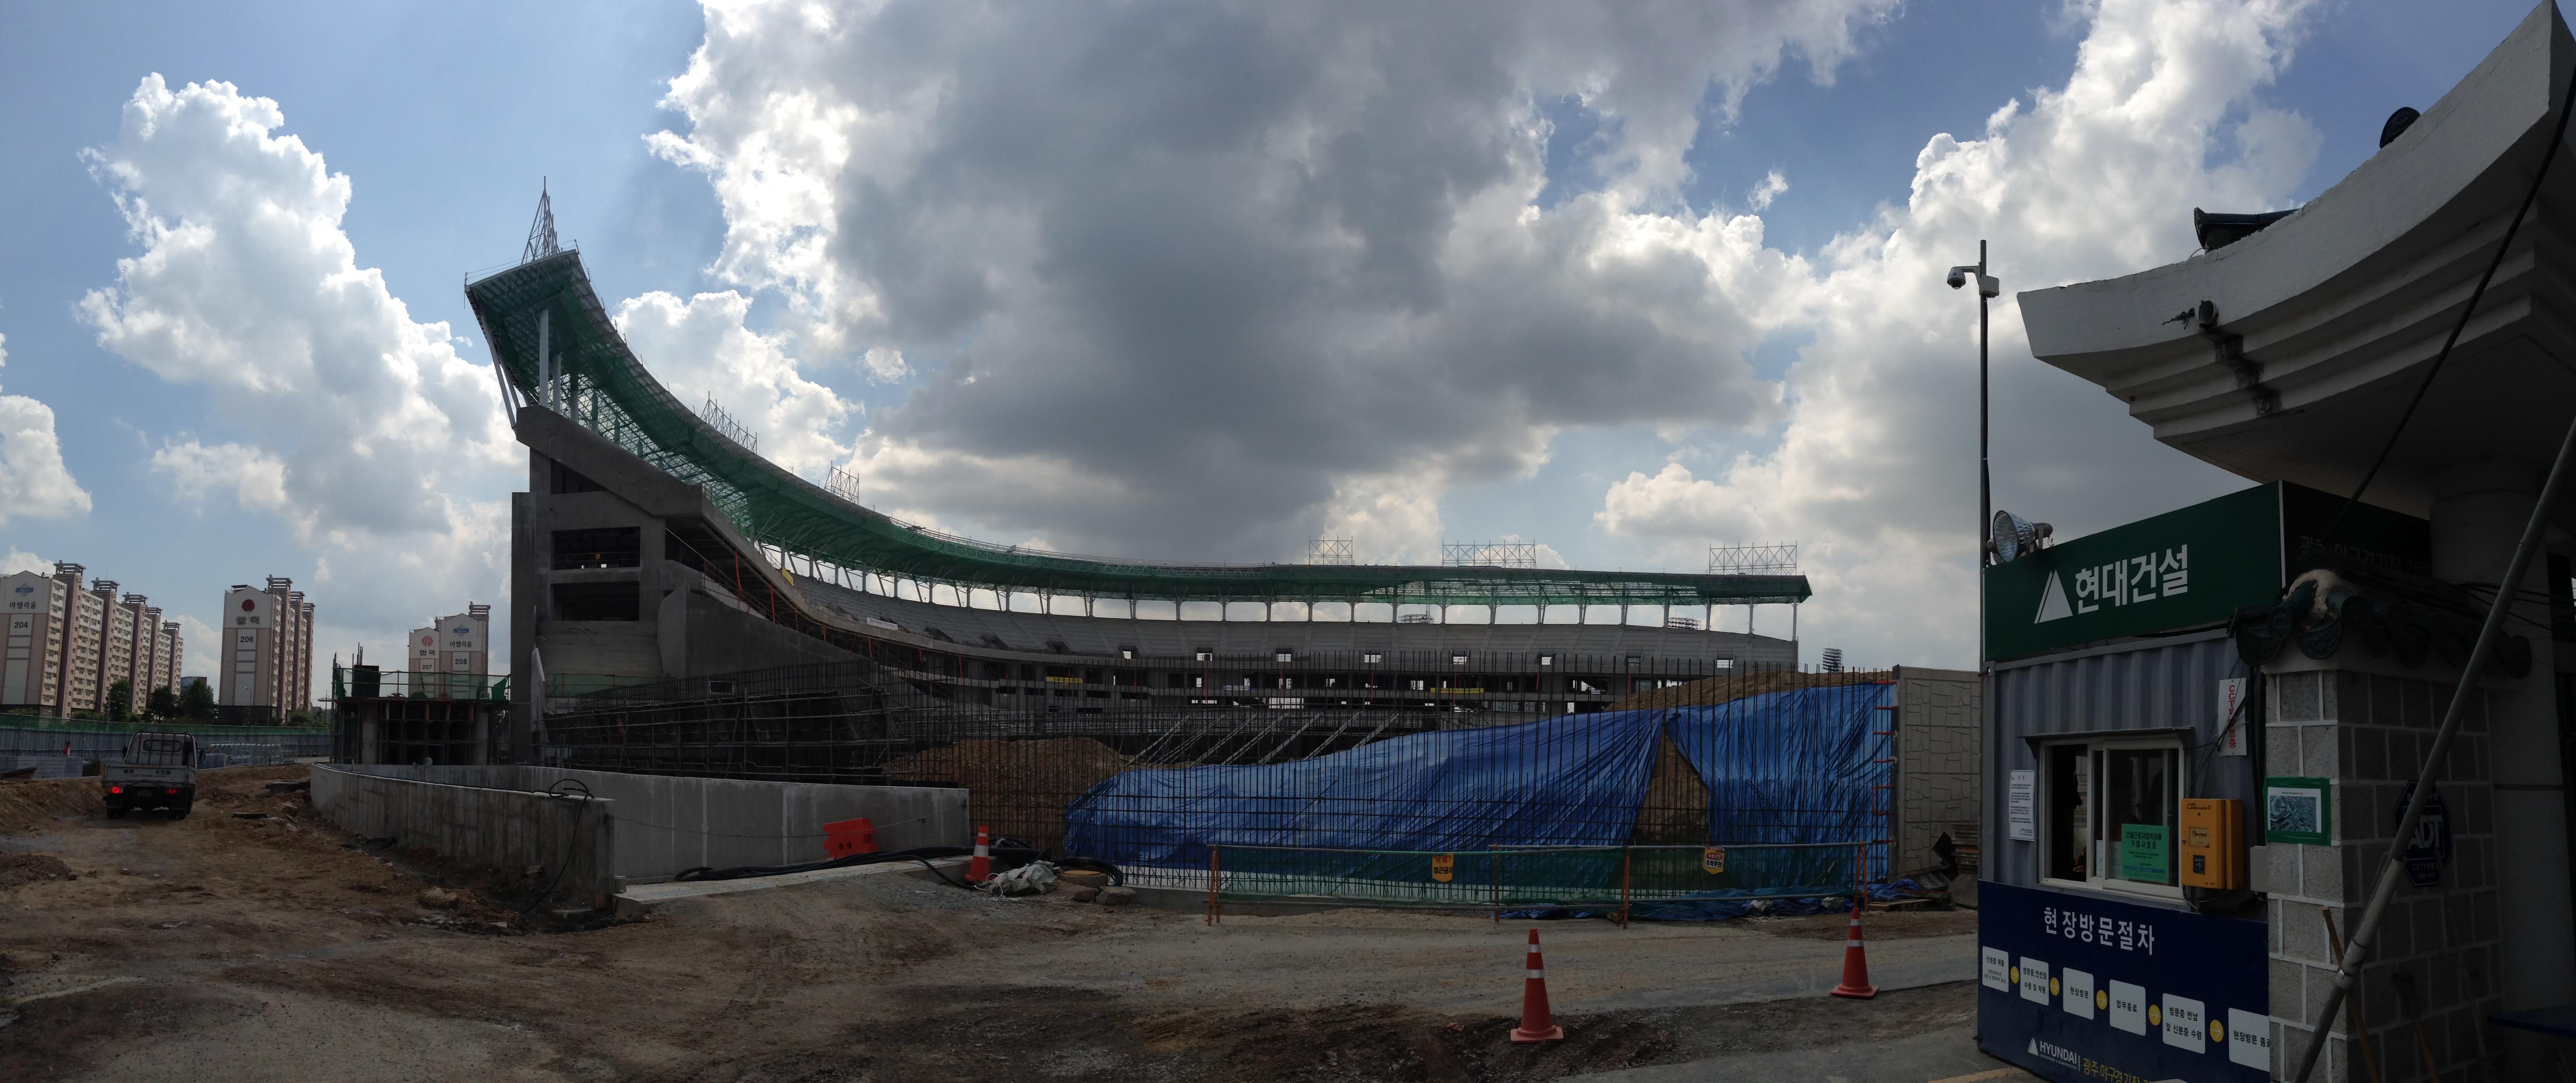 Hwangju Riverside Stadium